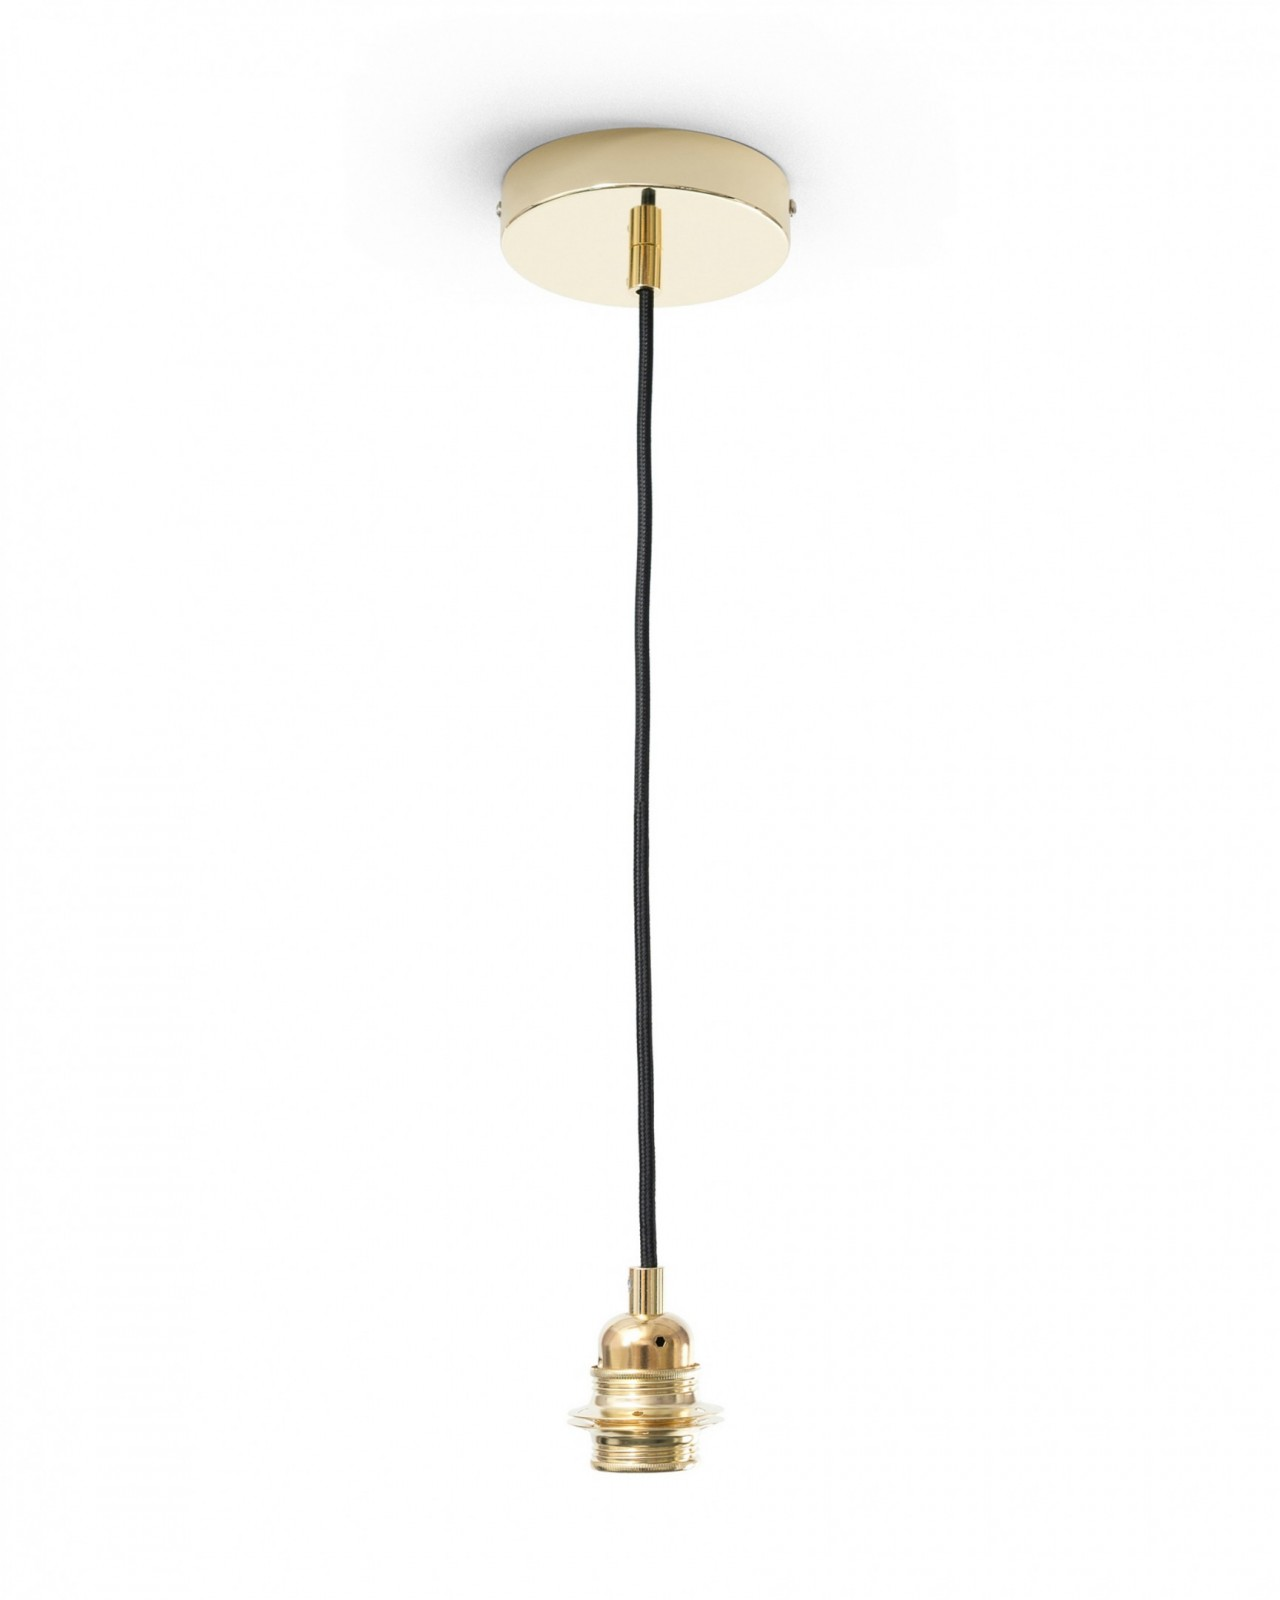 SEASIDE TRELLIS Pendant Lamp